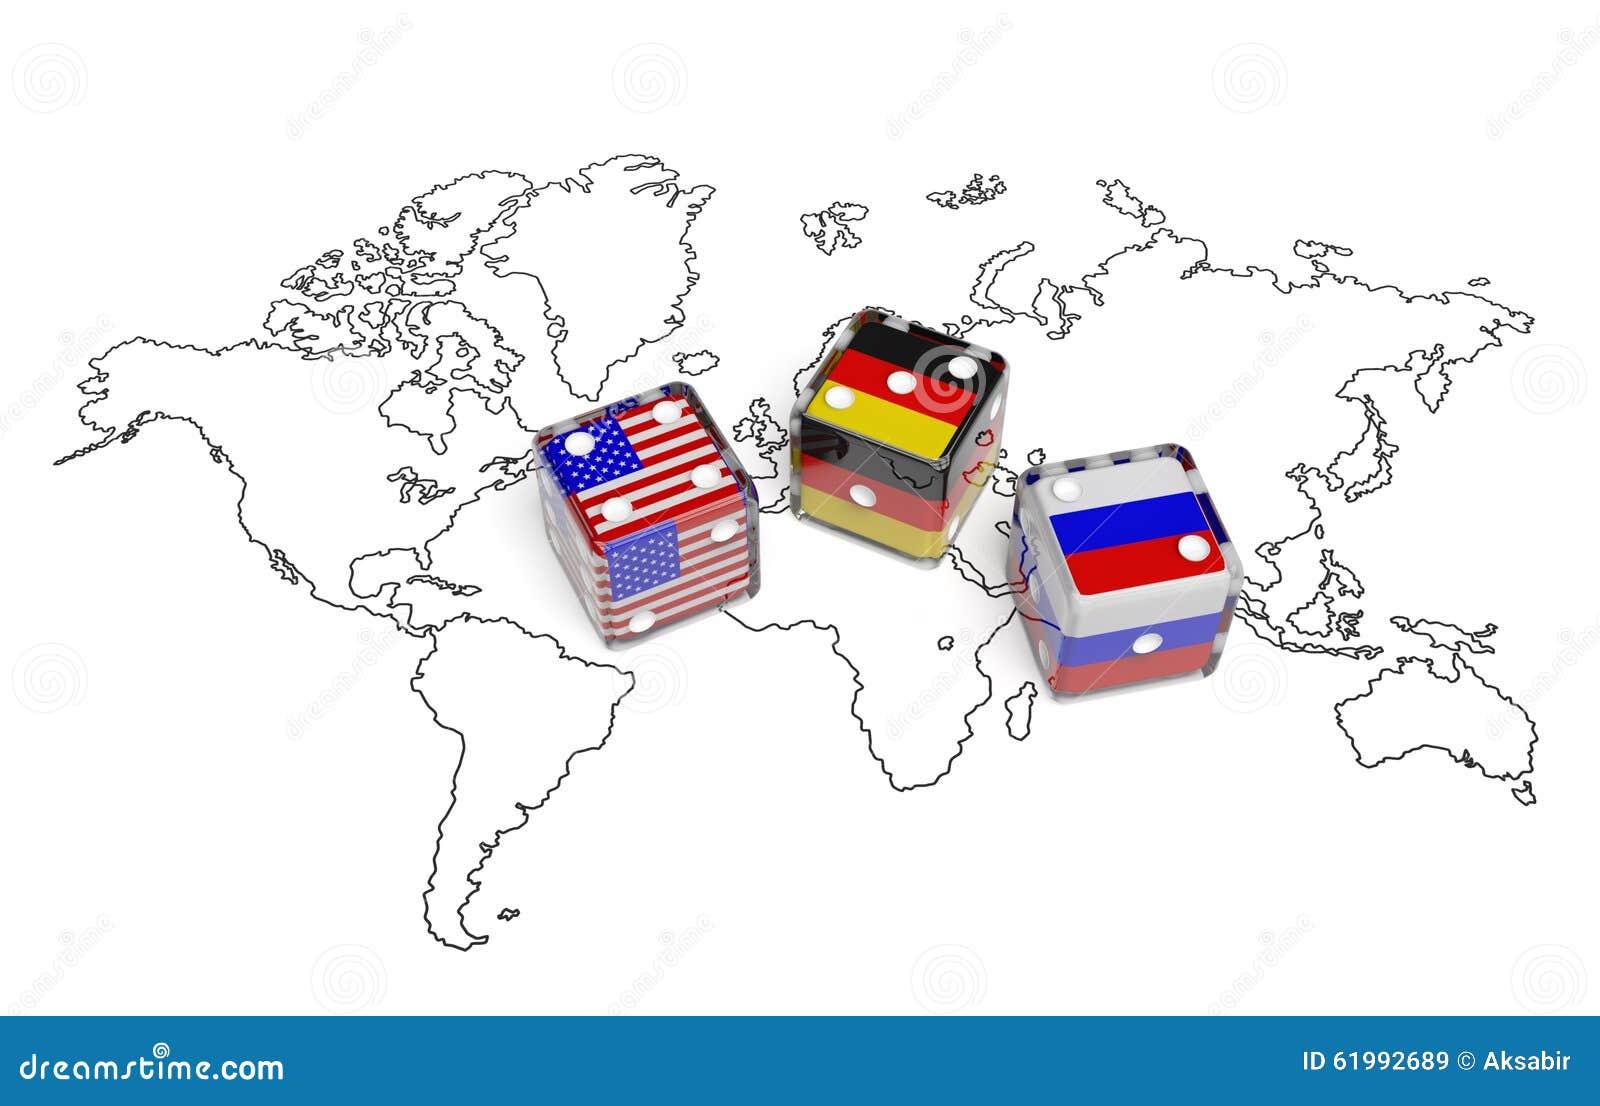 Spant mellan usa och ryssland